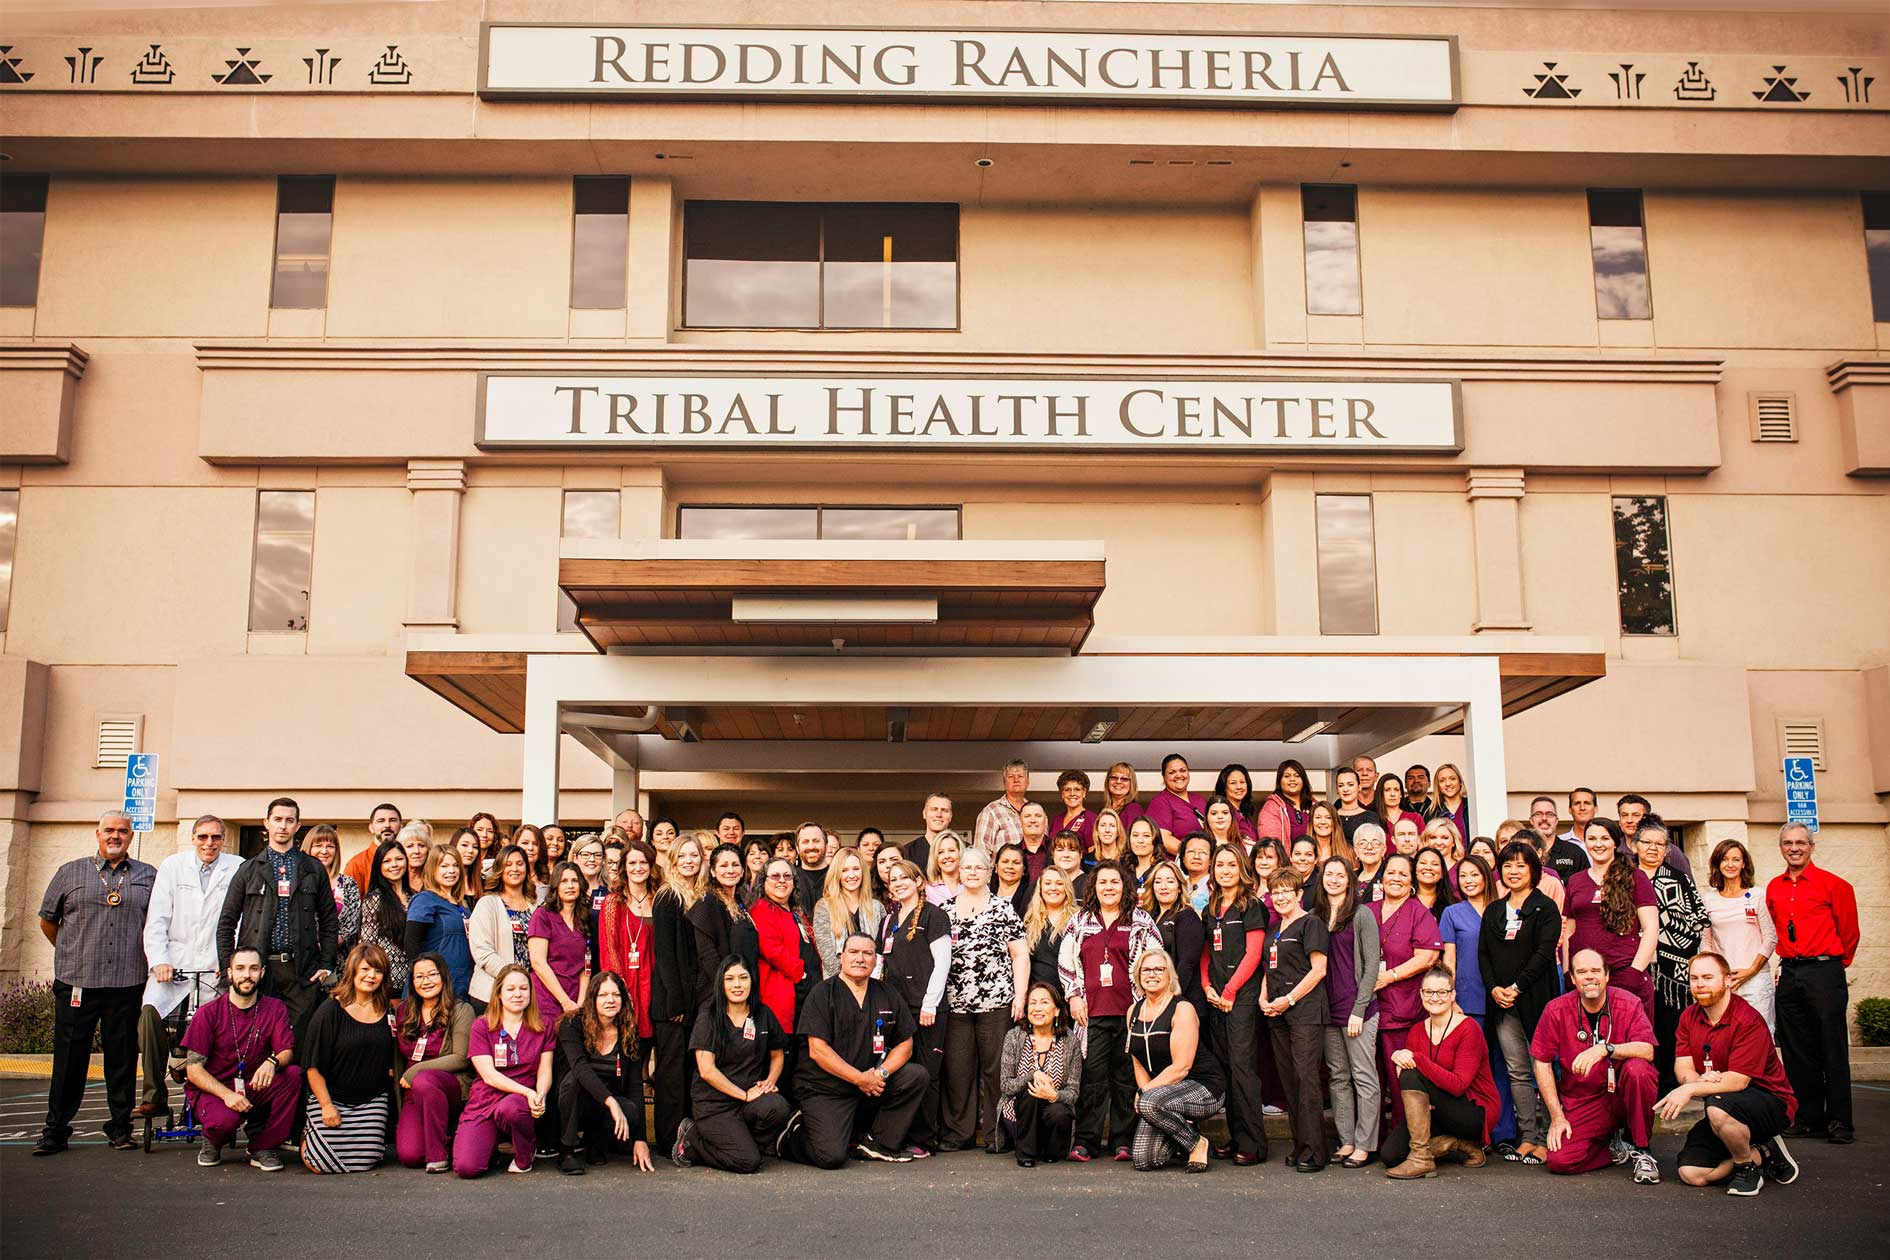 Redding Rancheria Tribal Health Center